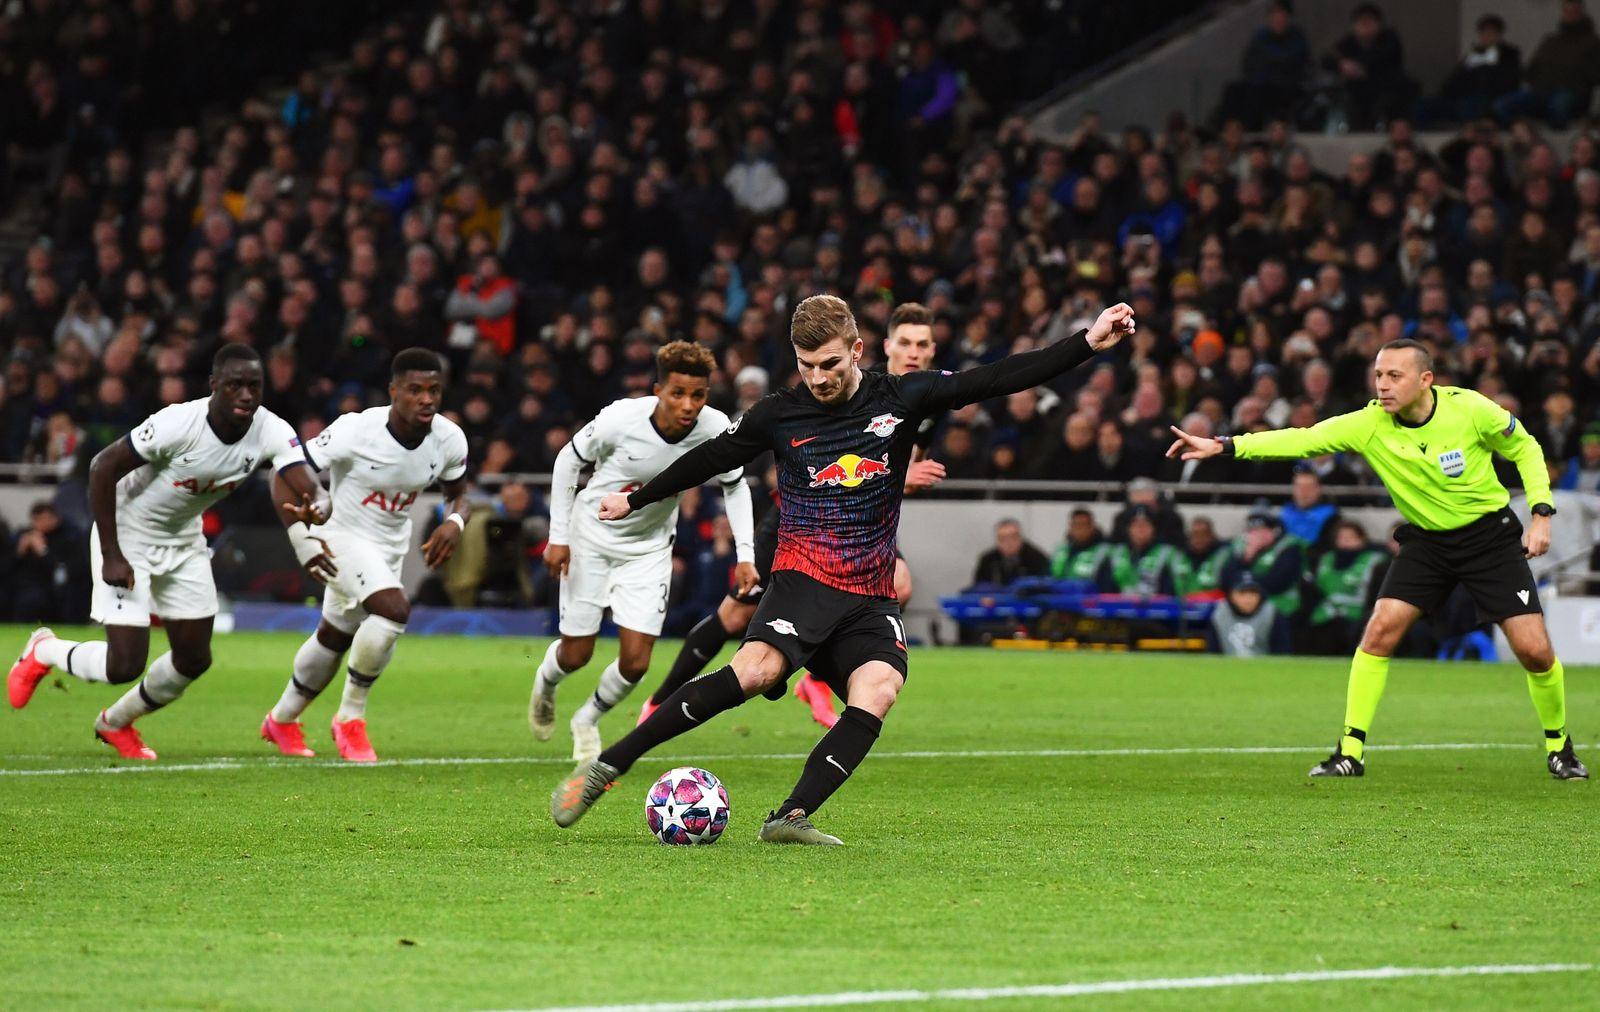 Tottenham Hotspur vs RB Leipzig, London, United Kingdom - 19 Feb 2020